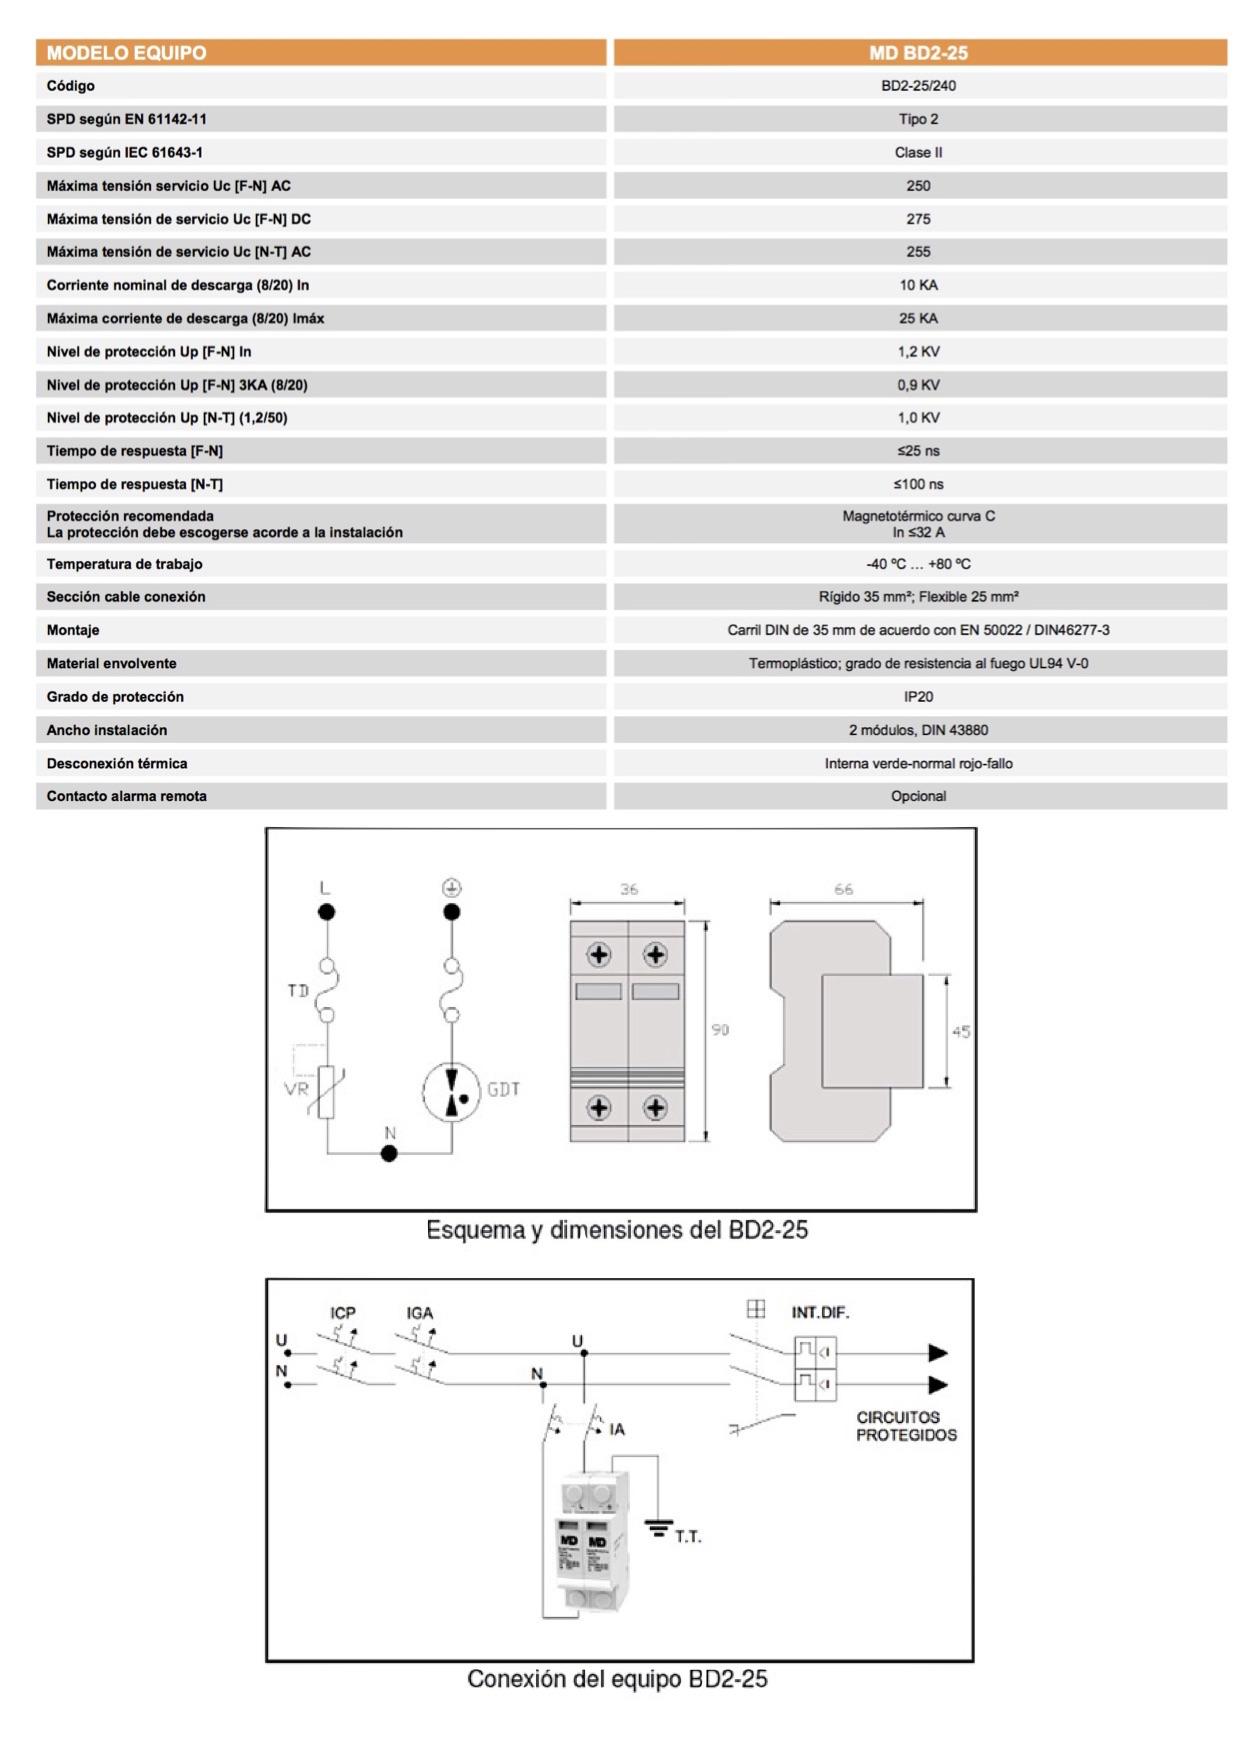 Caracteristicas_BD2.jpg